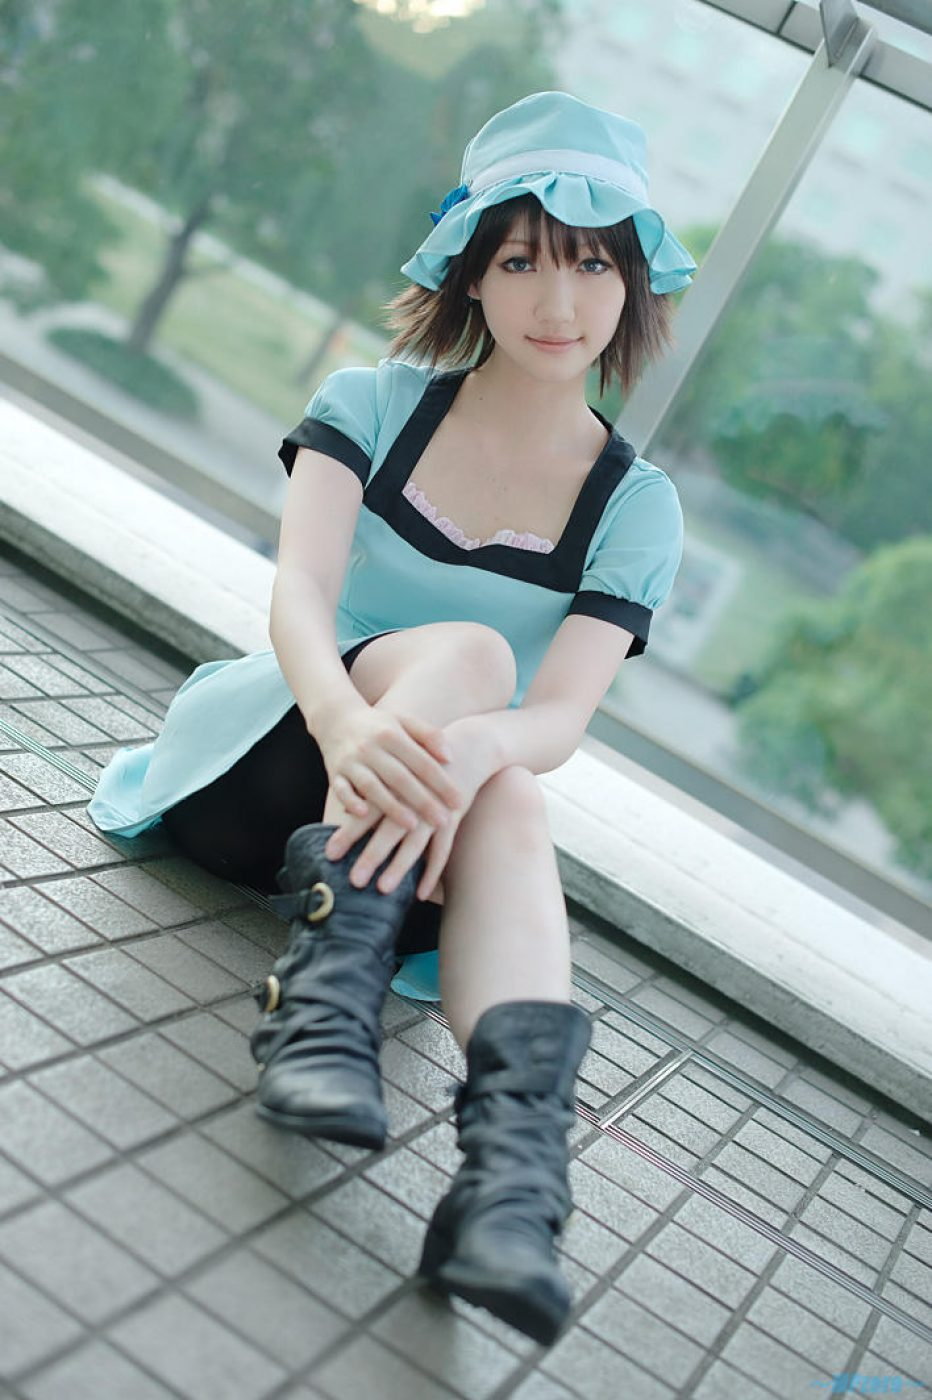 SteinsGate-Shiina-Mayuri-Cosplay-Gamers-Heroes-6.jpg